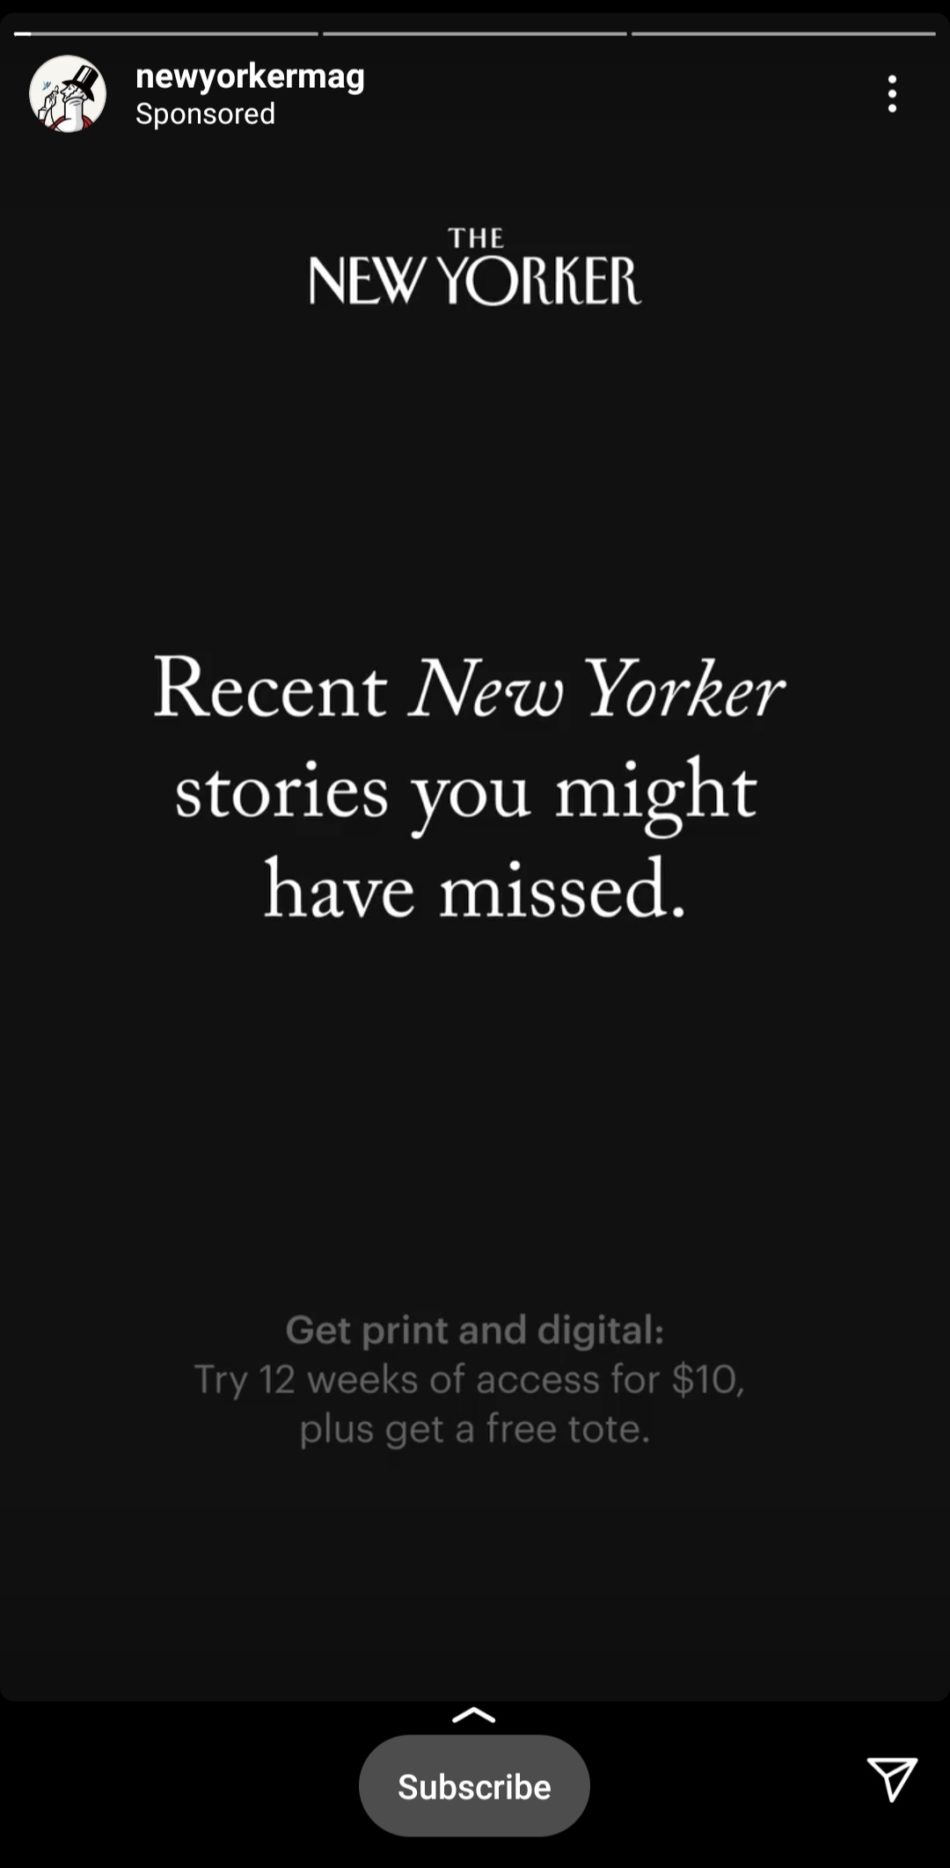 New Yorker Instagram ad